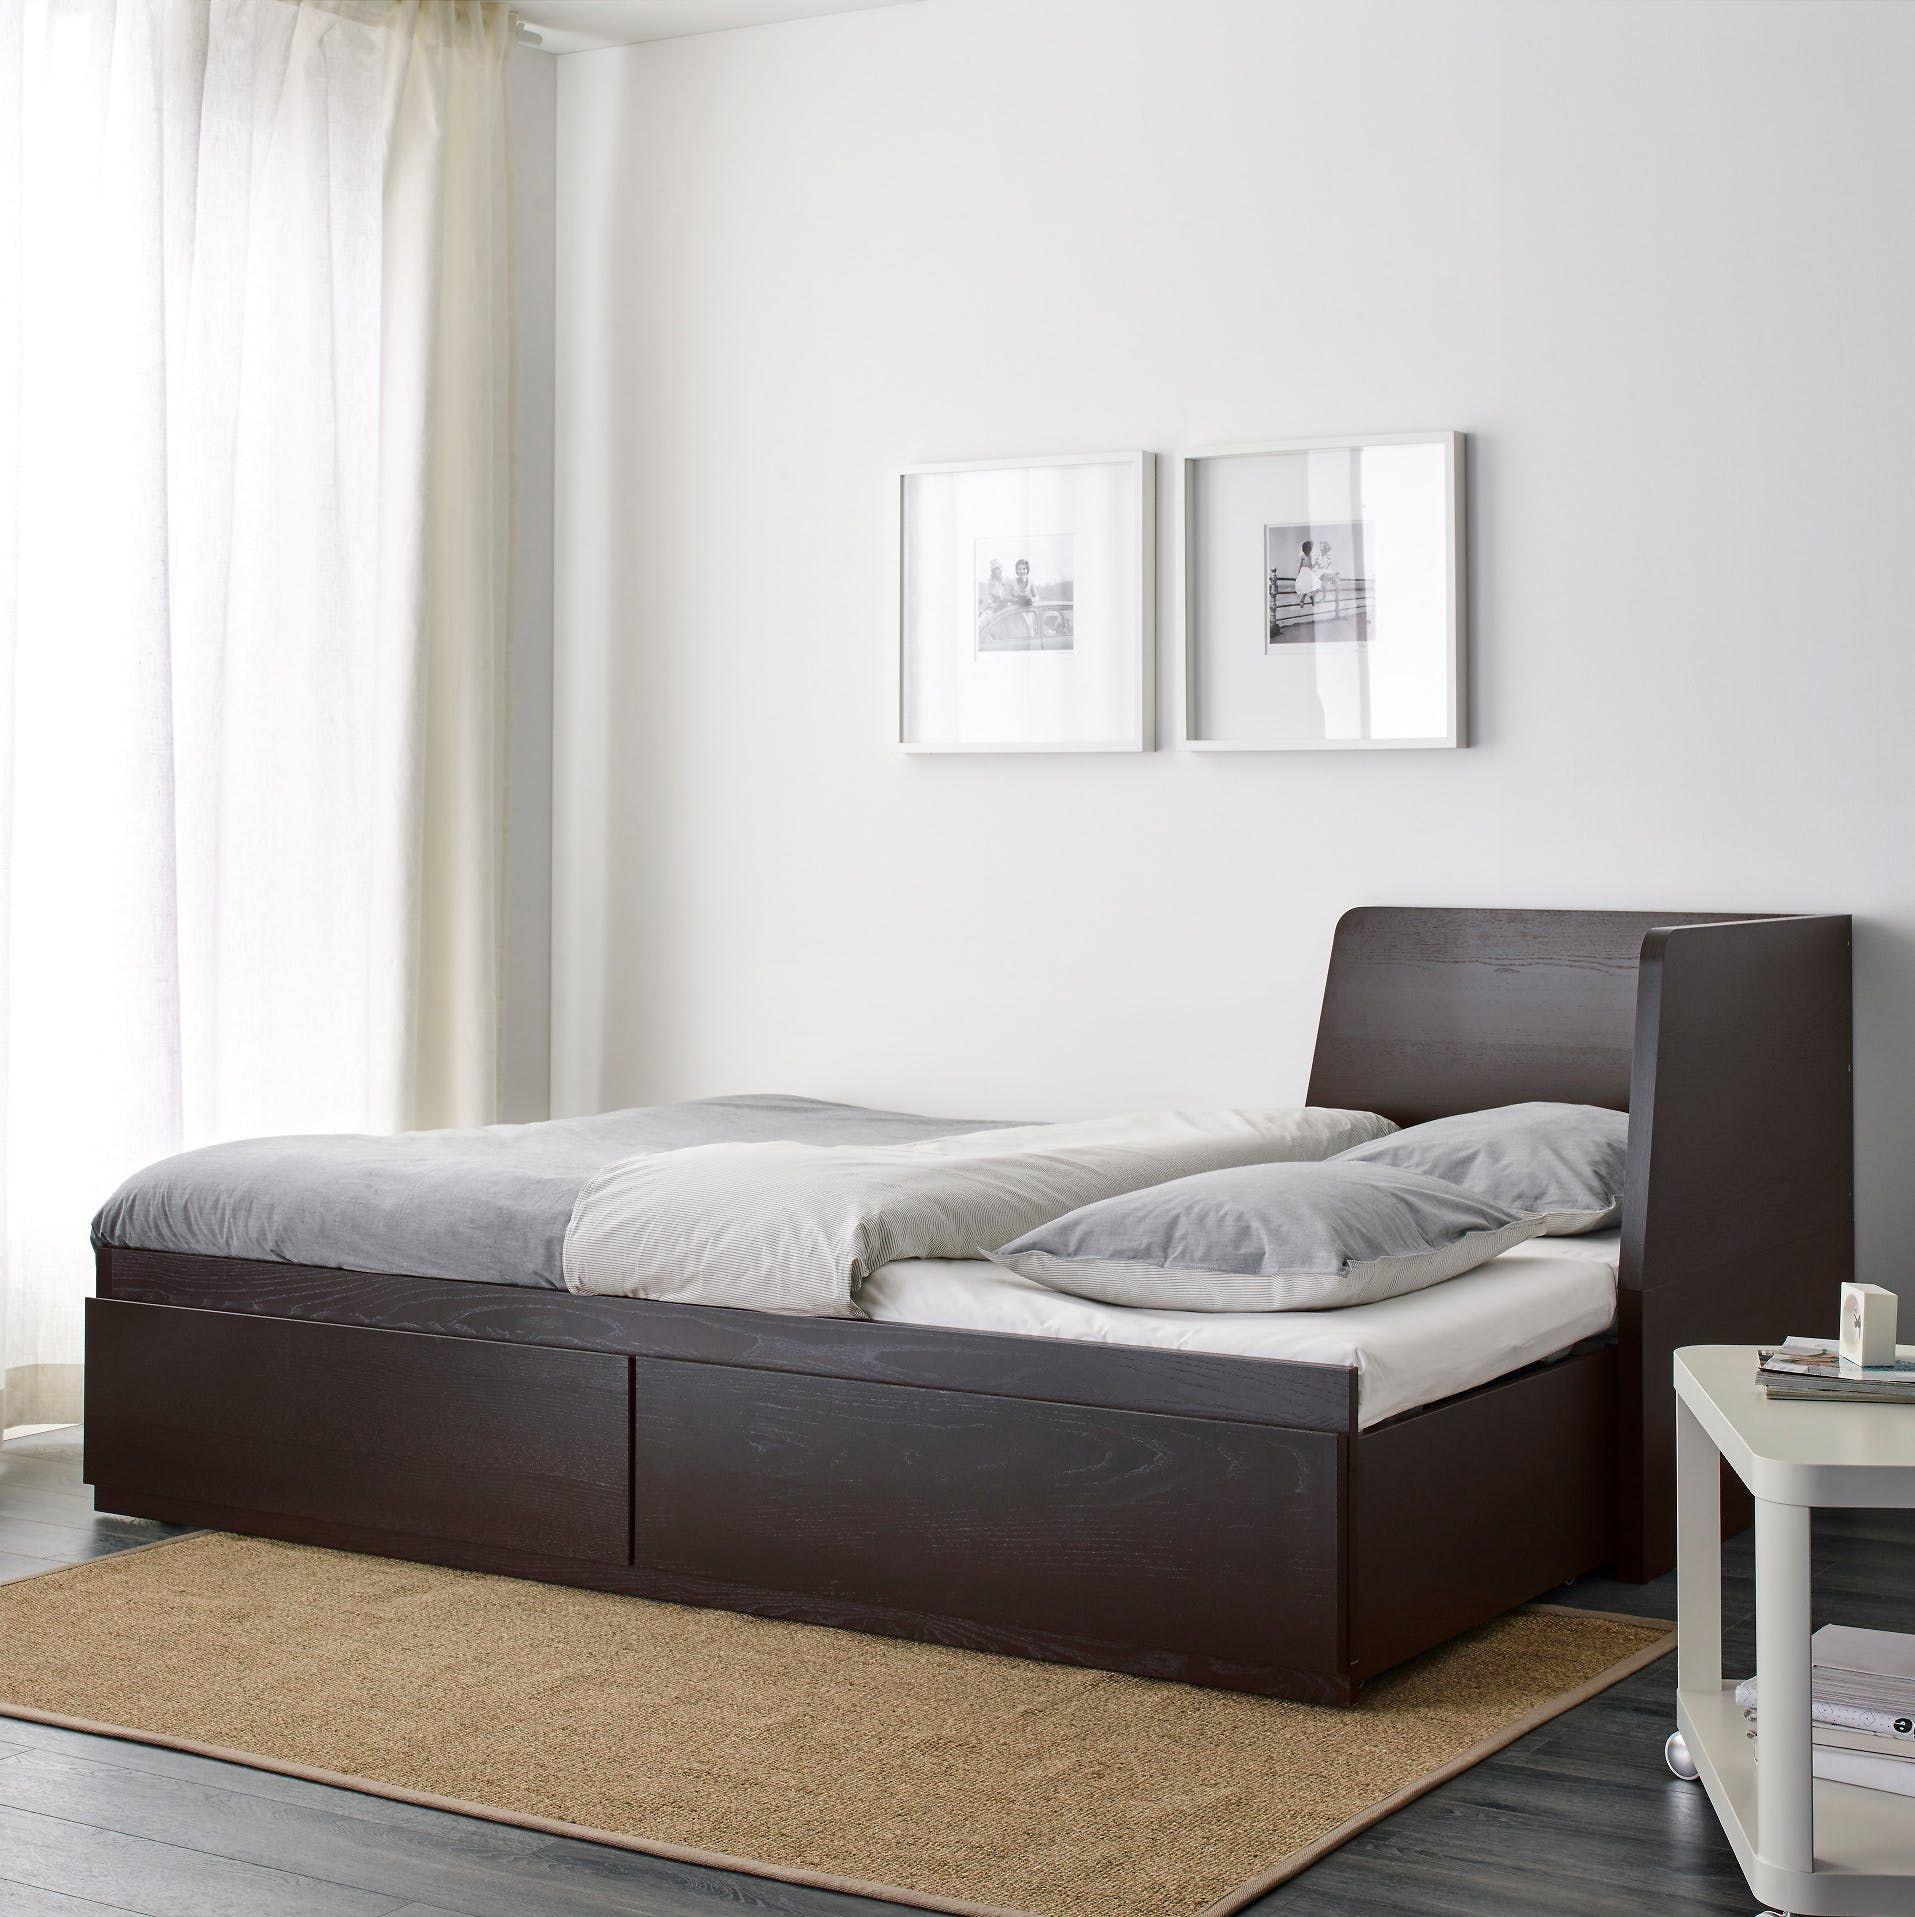 4 FLEKKE Daybed Day bed frame, Murphy bed ikea, Daybed